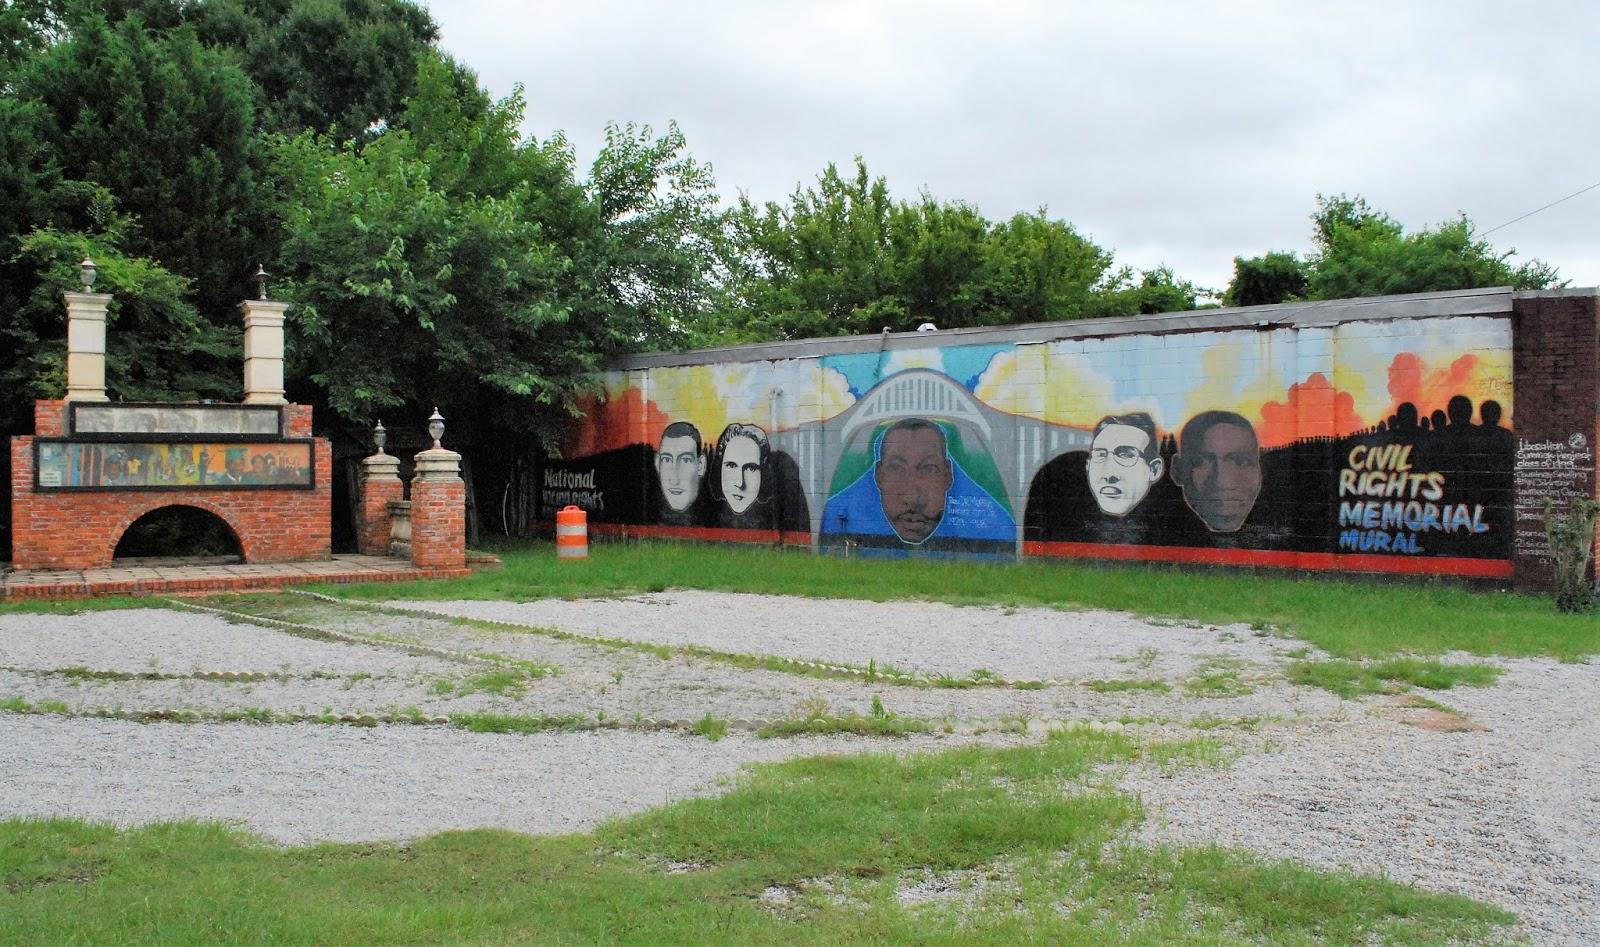 Bar None Group Civil Rights Memorial Mural Outside Selma Alabama